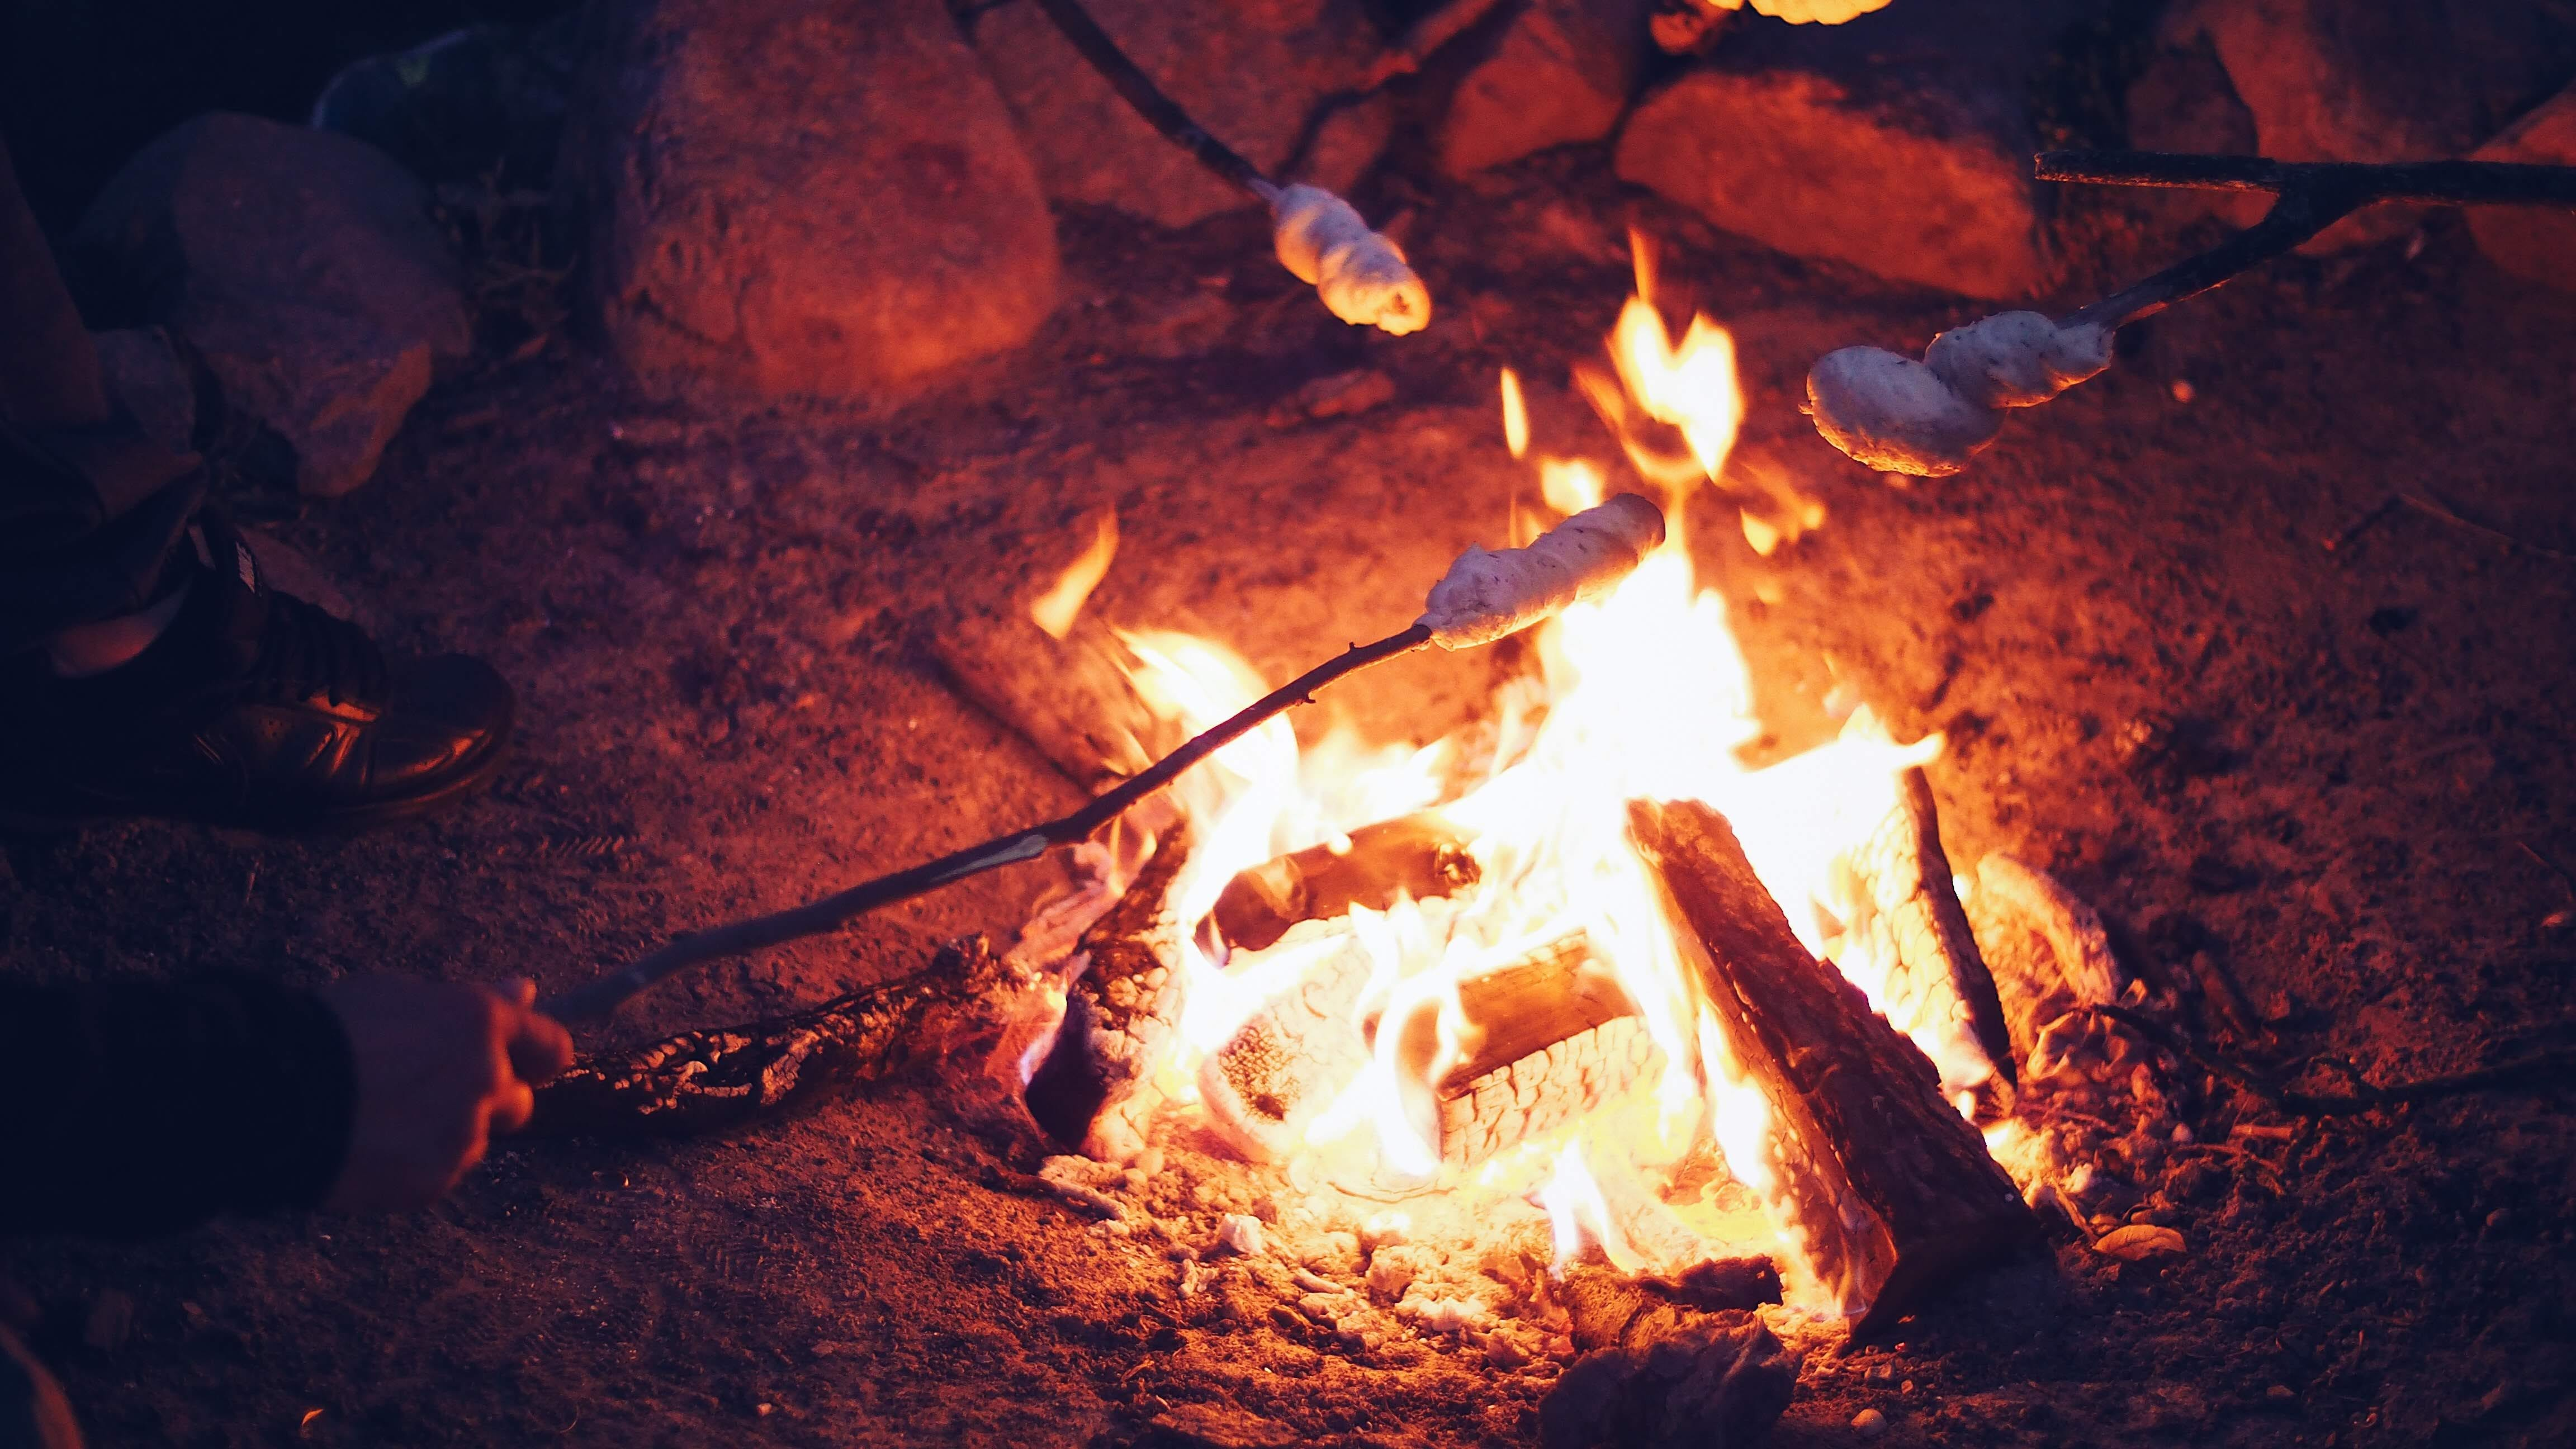 Kostenloses Stock Foto zu brand, brennen, brennholz, dunkel